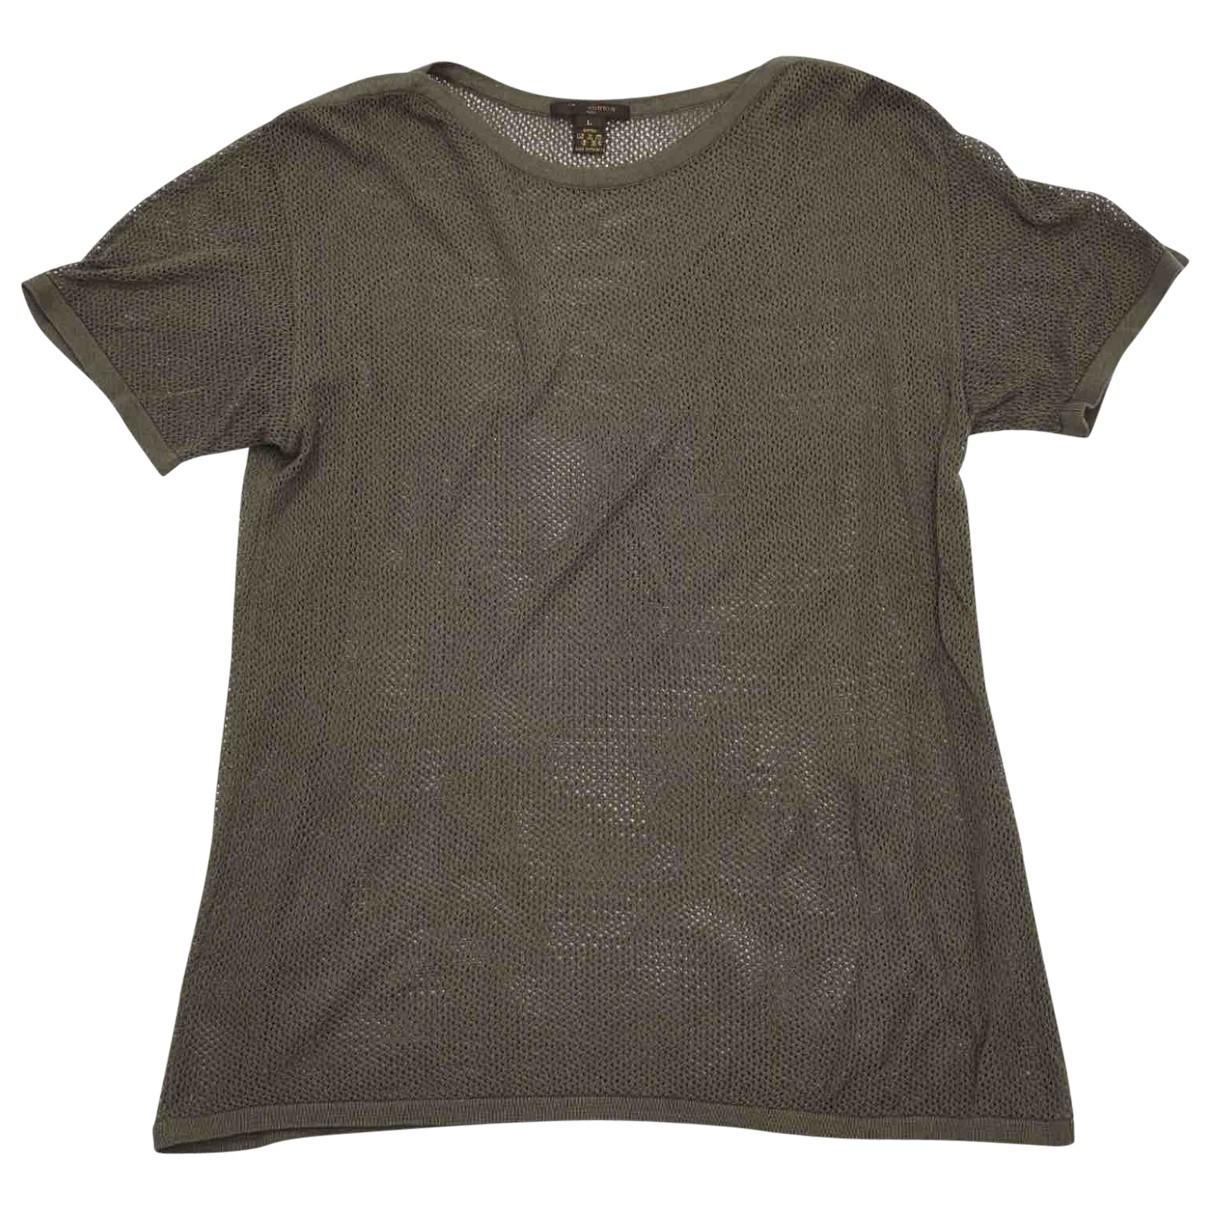 Louis Vuitton \N Khaki Cotton T-shirts for Men L International